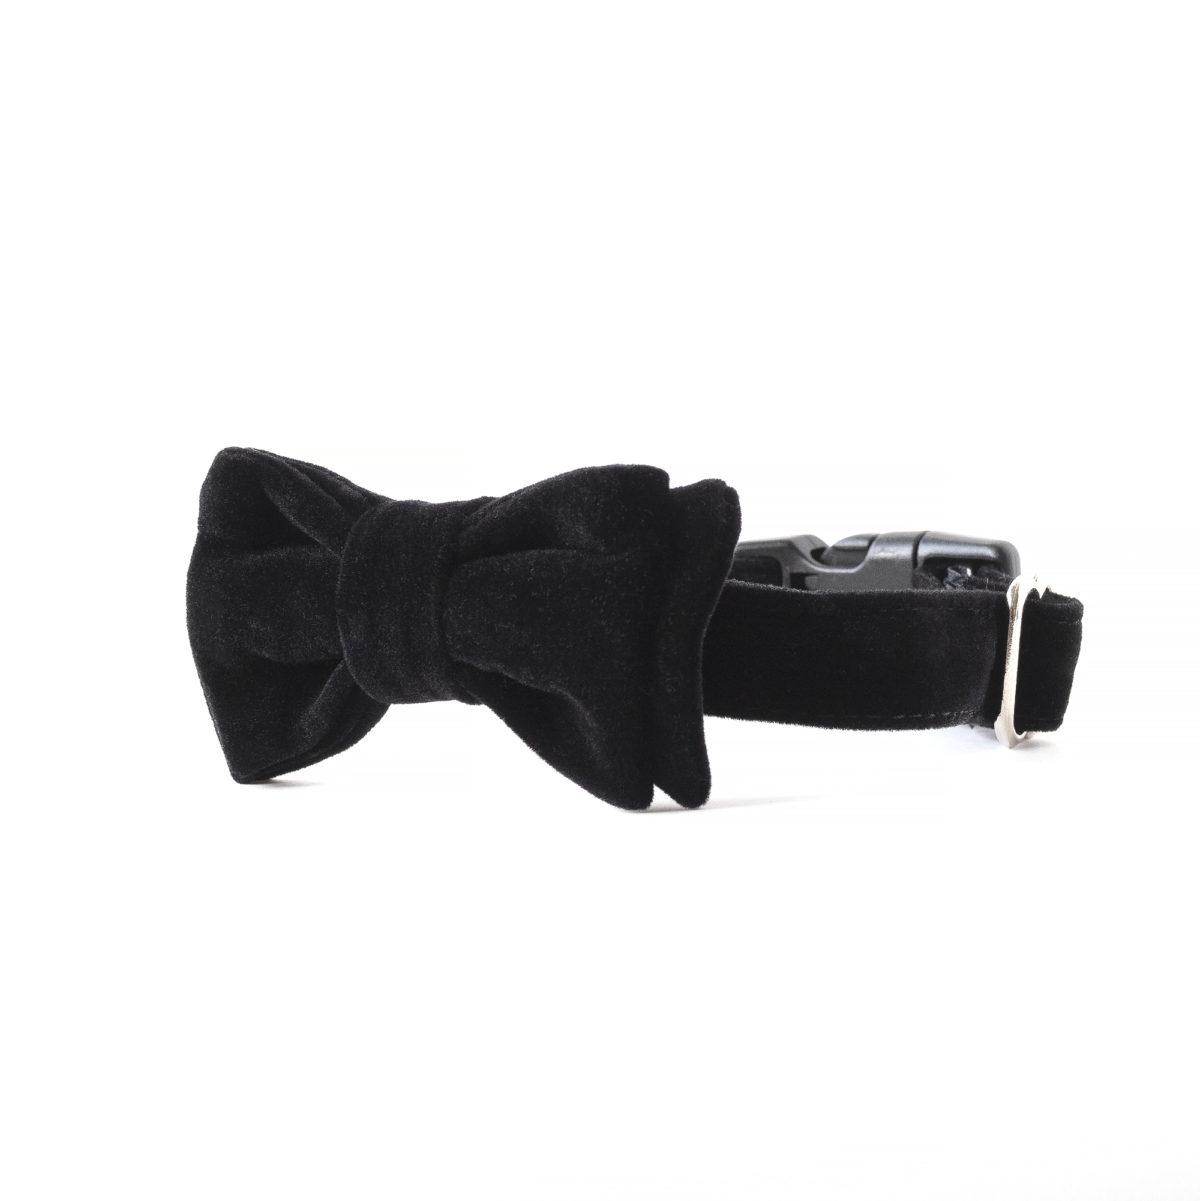 Bond Dog Bow Tie